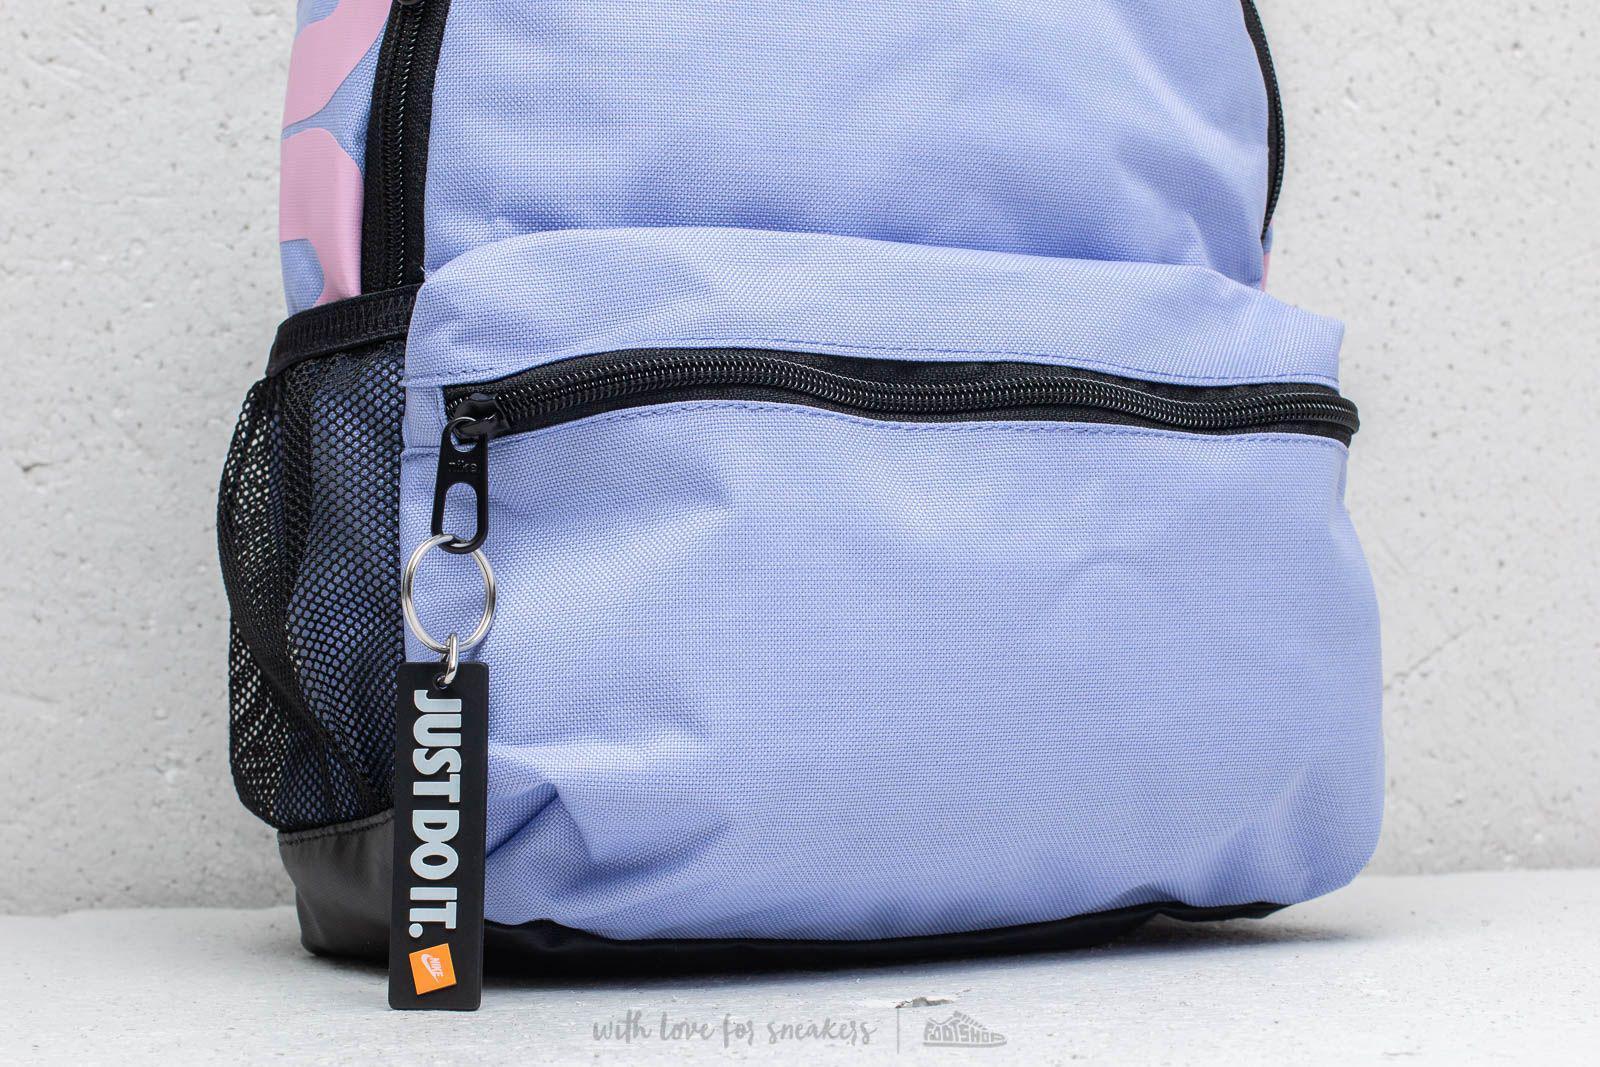 Lyst - Nike Brasilia Just Do It Mini Backpack Purple  Pink in Blue 274bcccca2